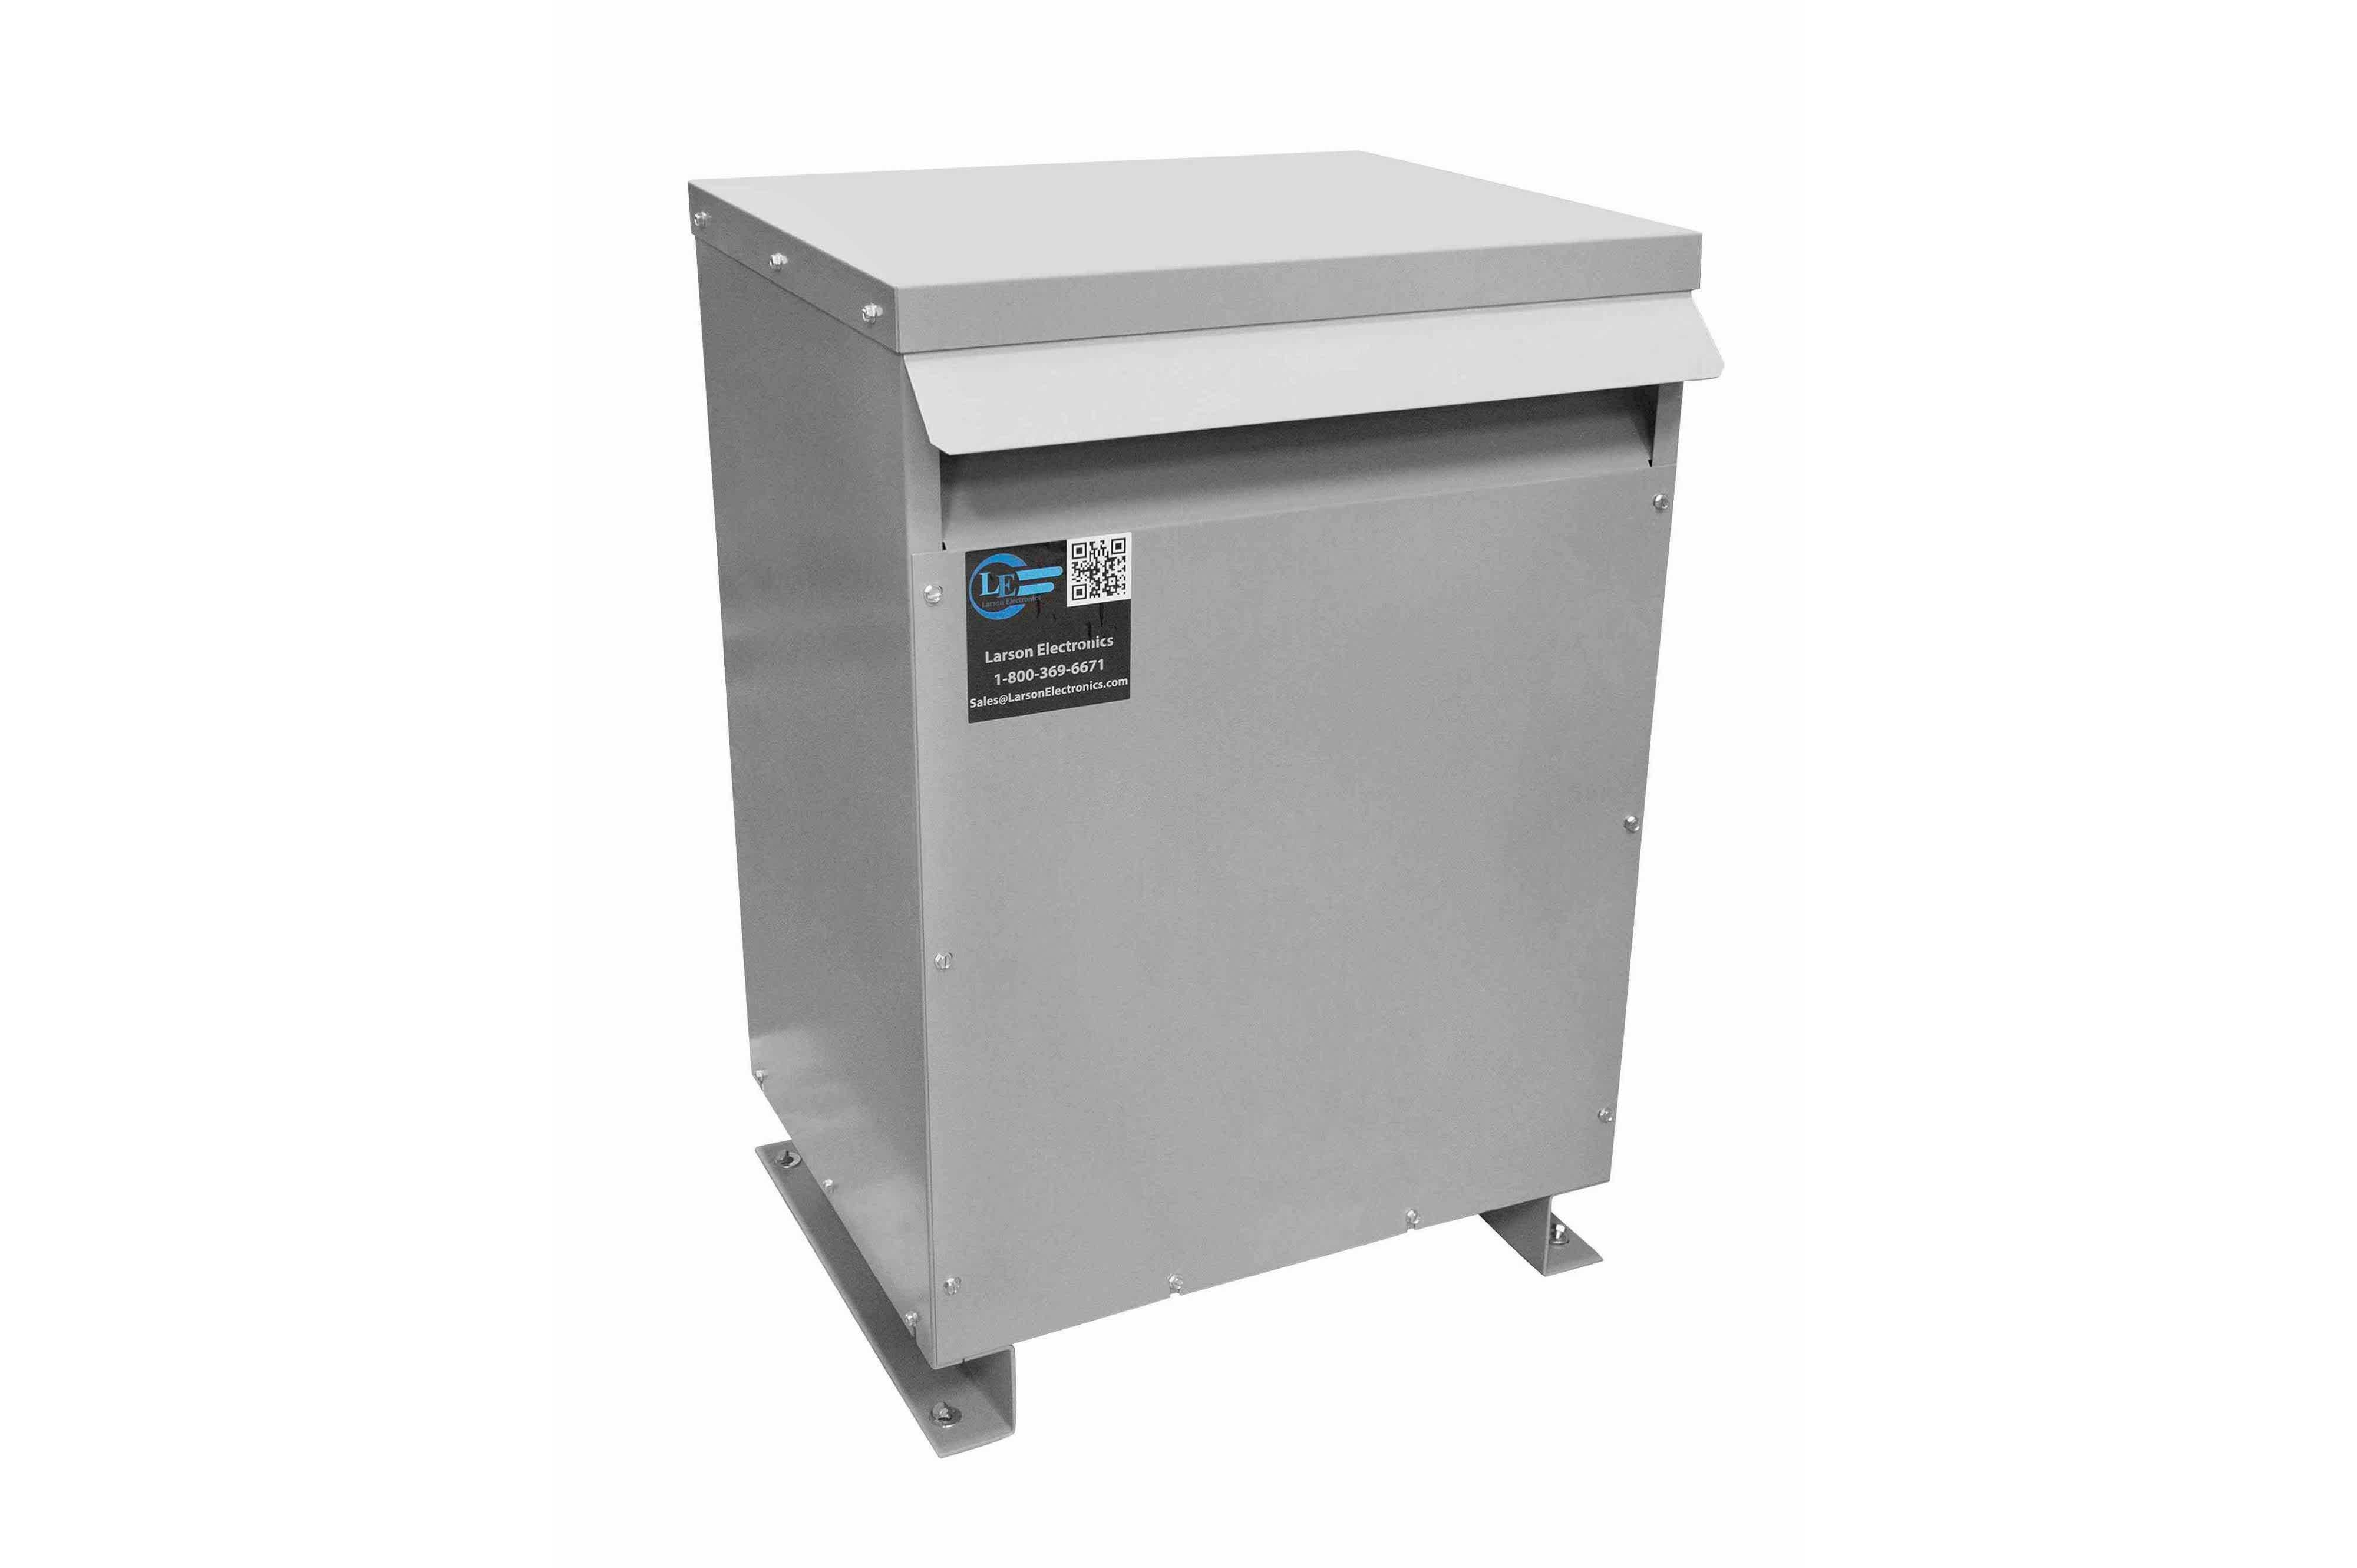 900 kVA 3PH Isolation Transformer, 480V Wye Primary, 480Y/277 Wye-N Secondary, N3R, Ventilated, 60 Hz